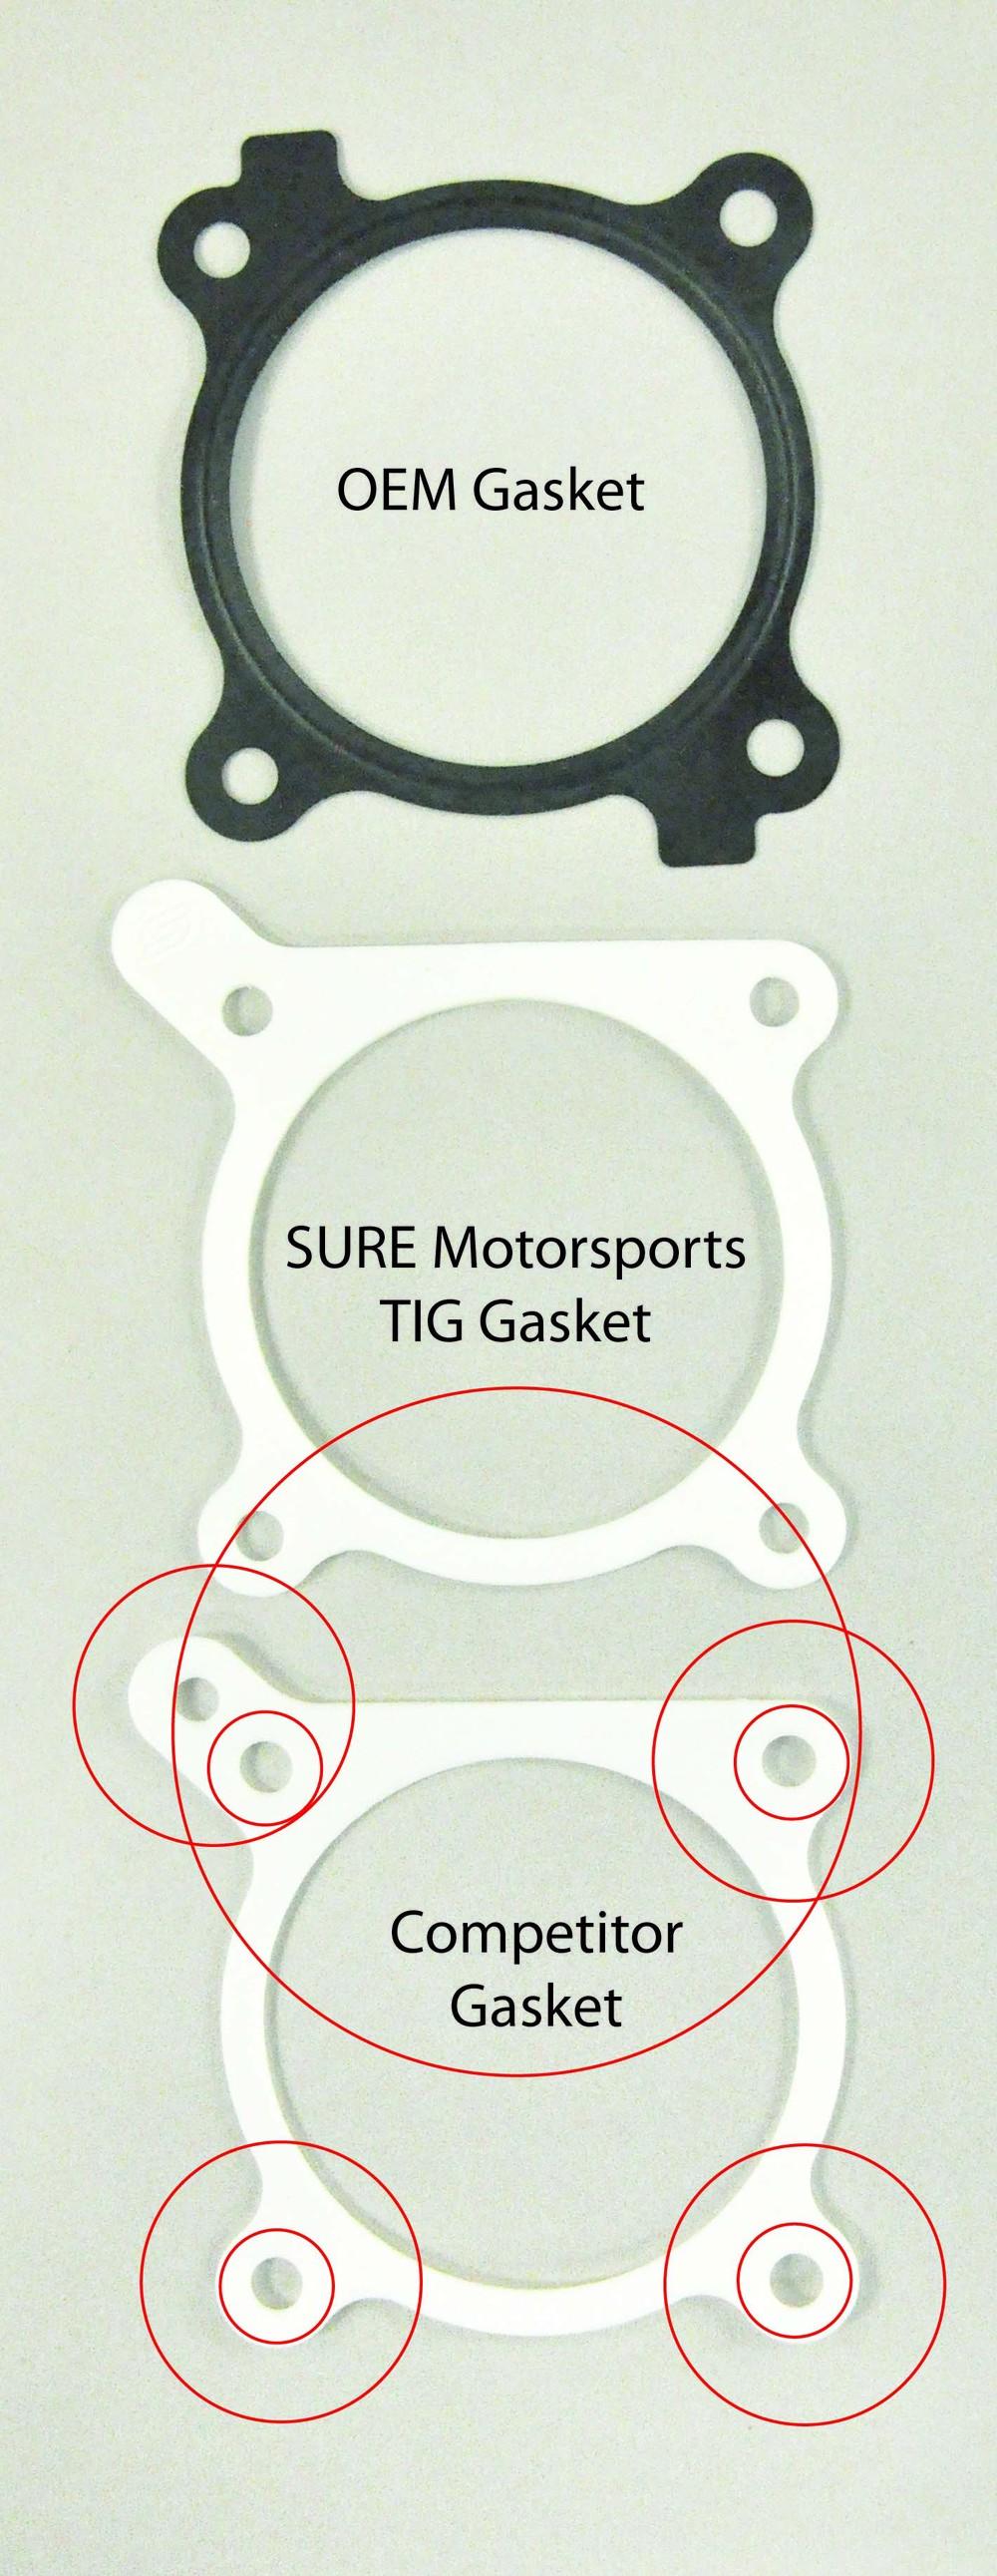 SUREMotorsports_TIG2.jpg